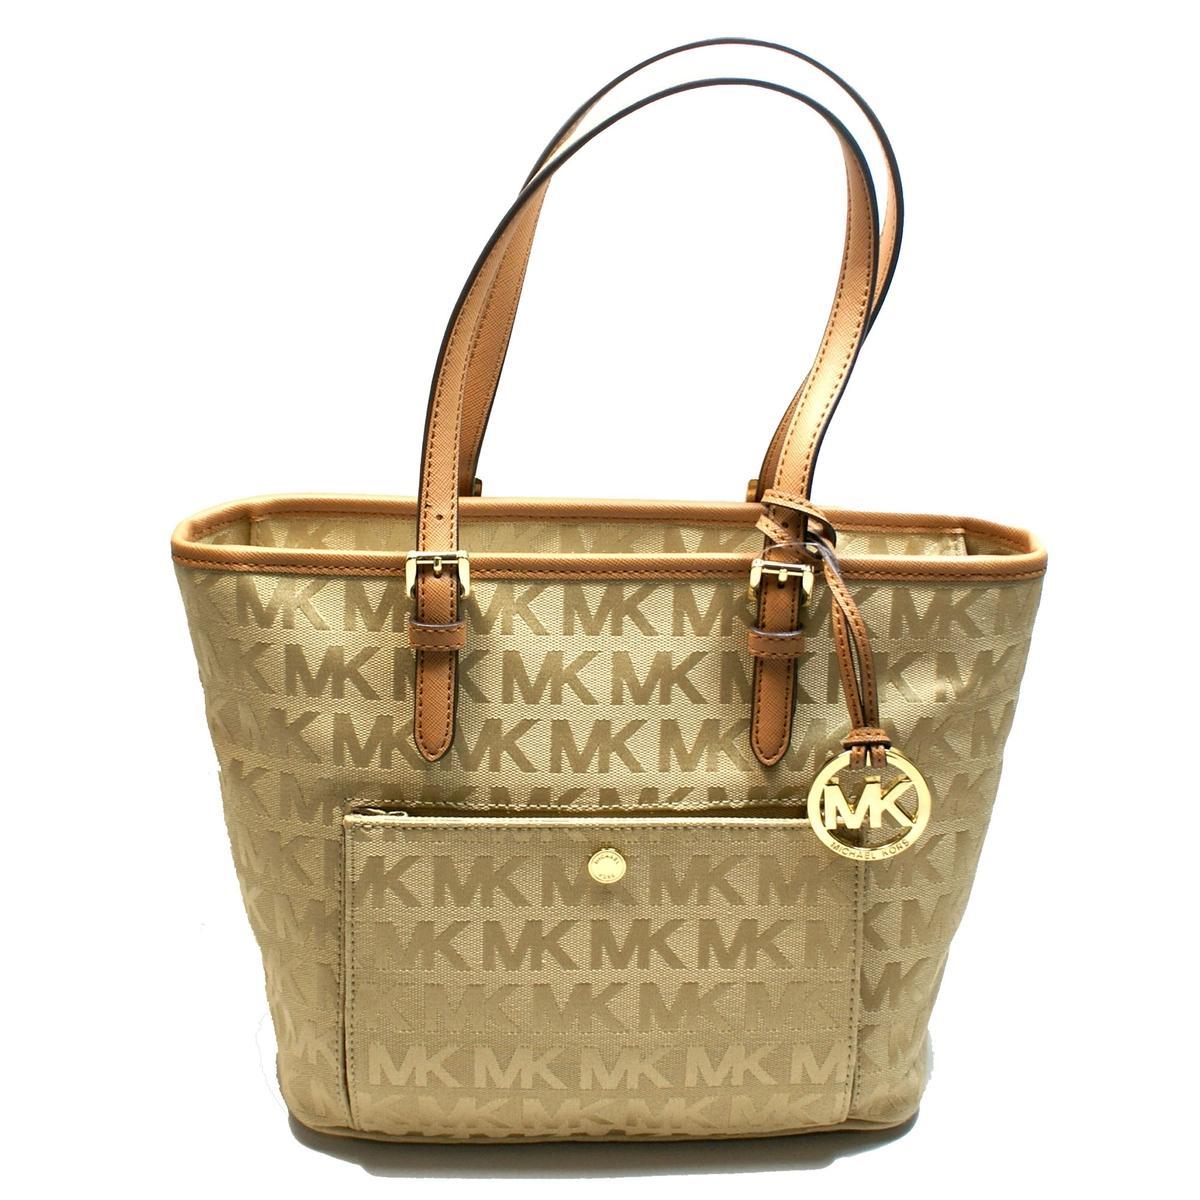 72673adca3f5 michael kors bag camel handbag jet set large signature travel tote vanilla